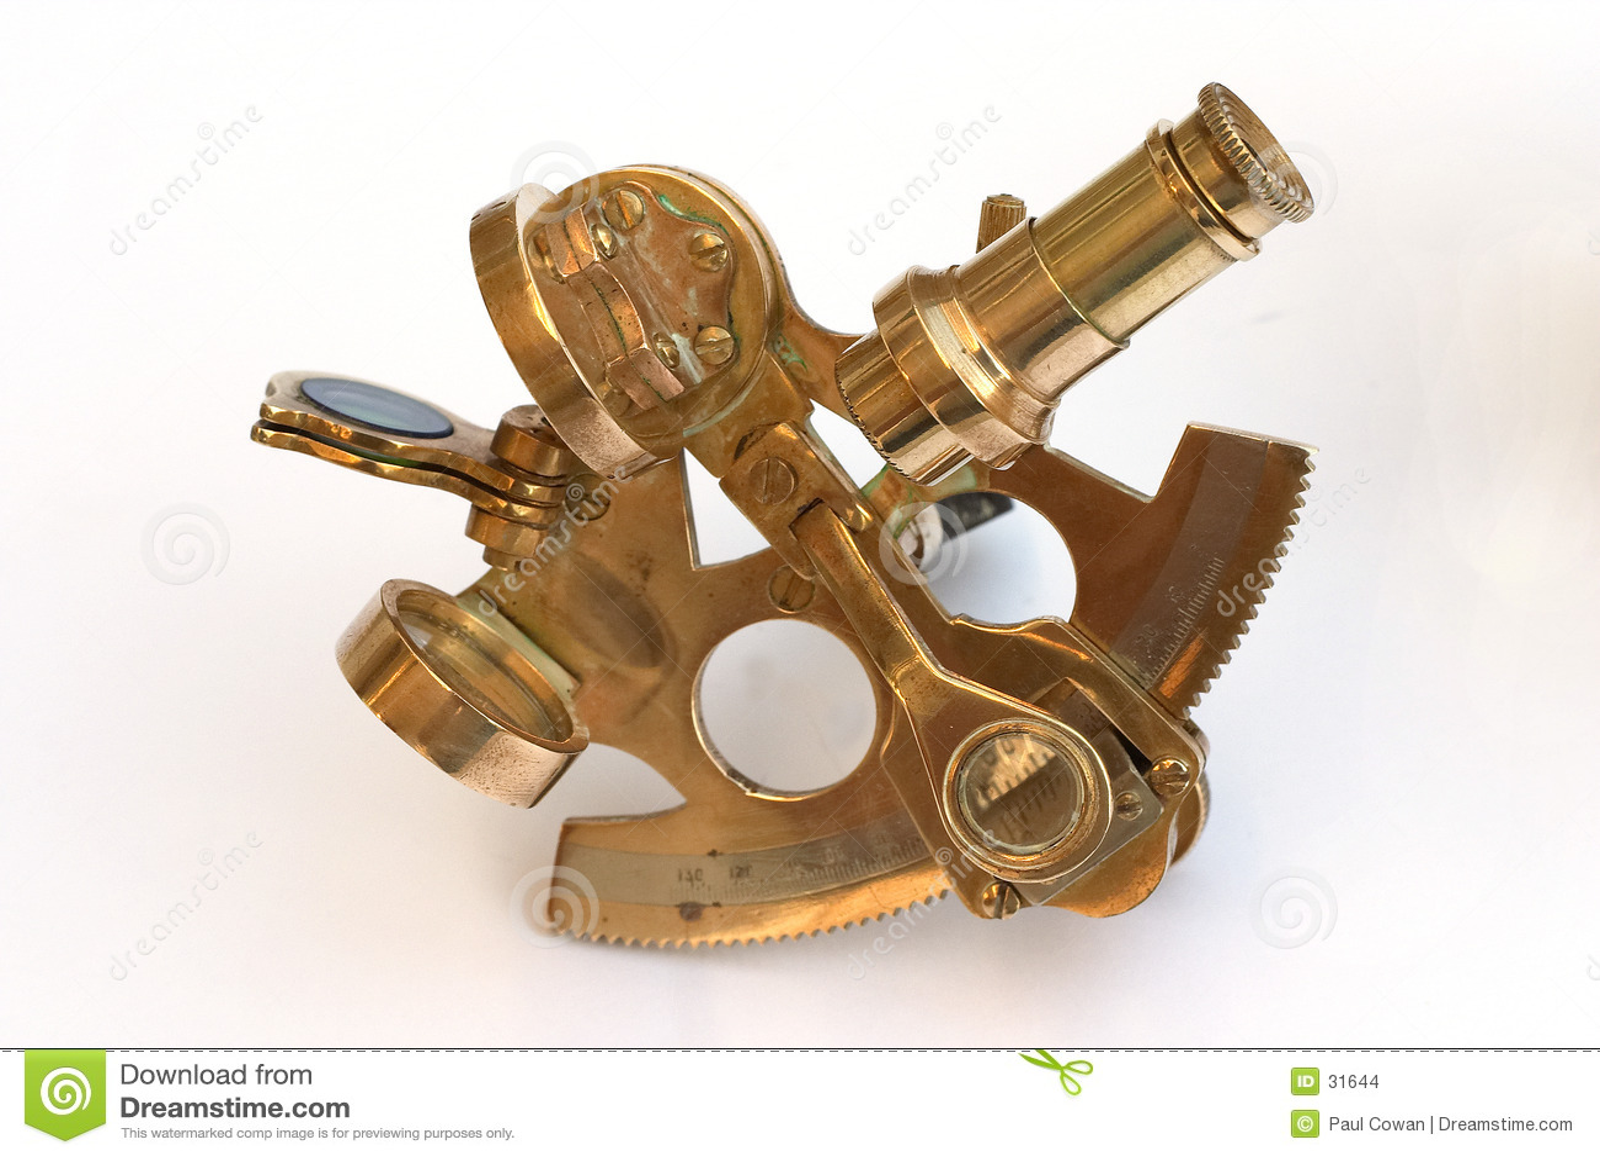 Pequeño sextante